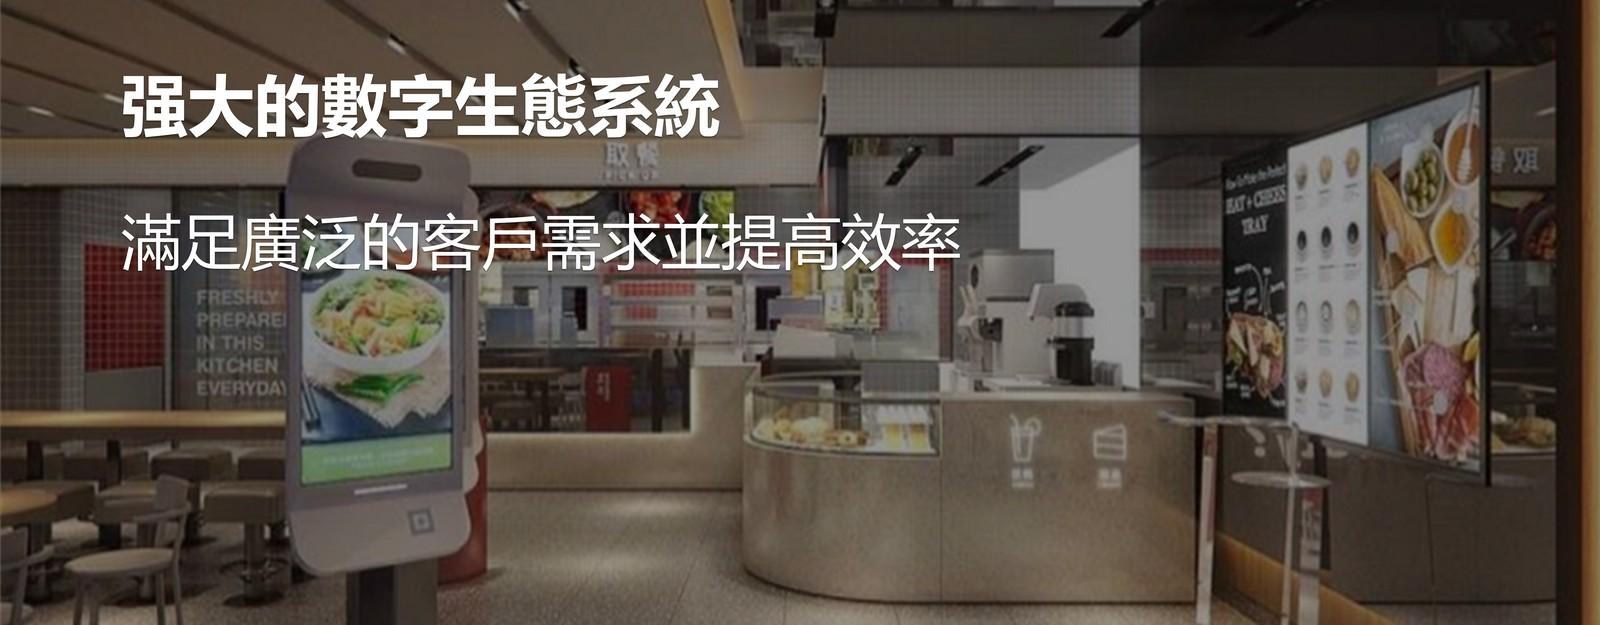 投資者概覽 | Yum China Holdings,566,233) 管理費用 6 (1, Inc.